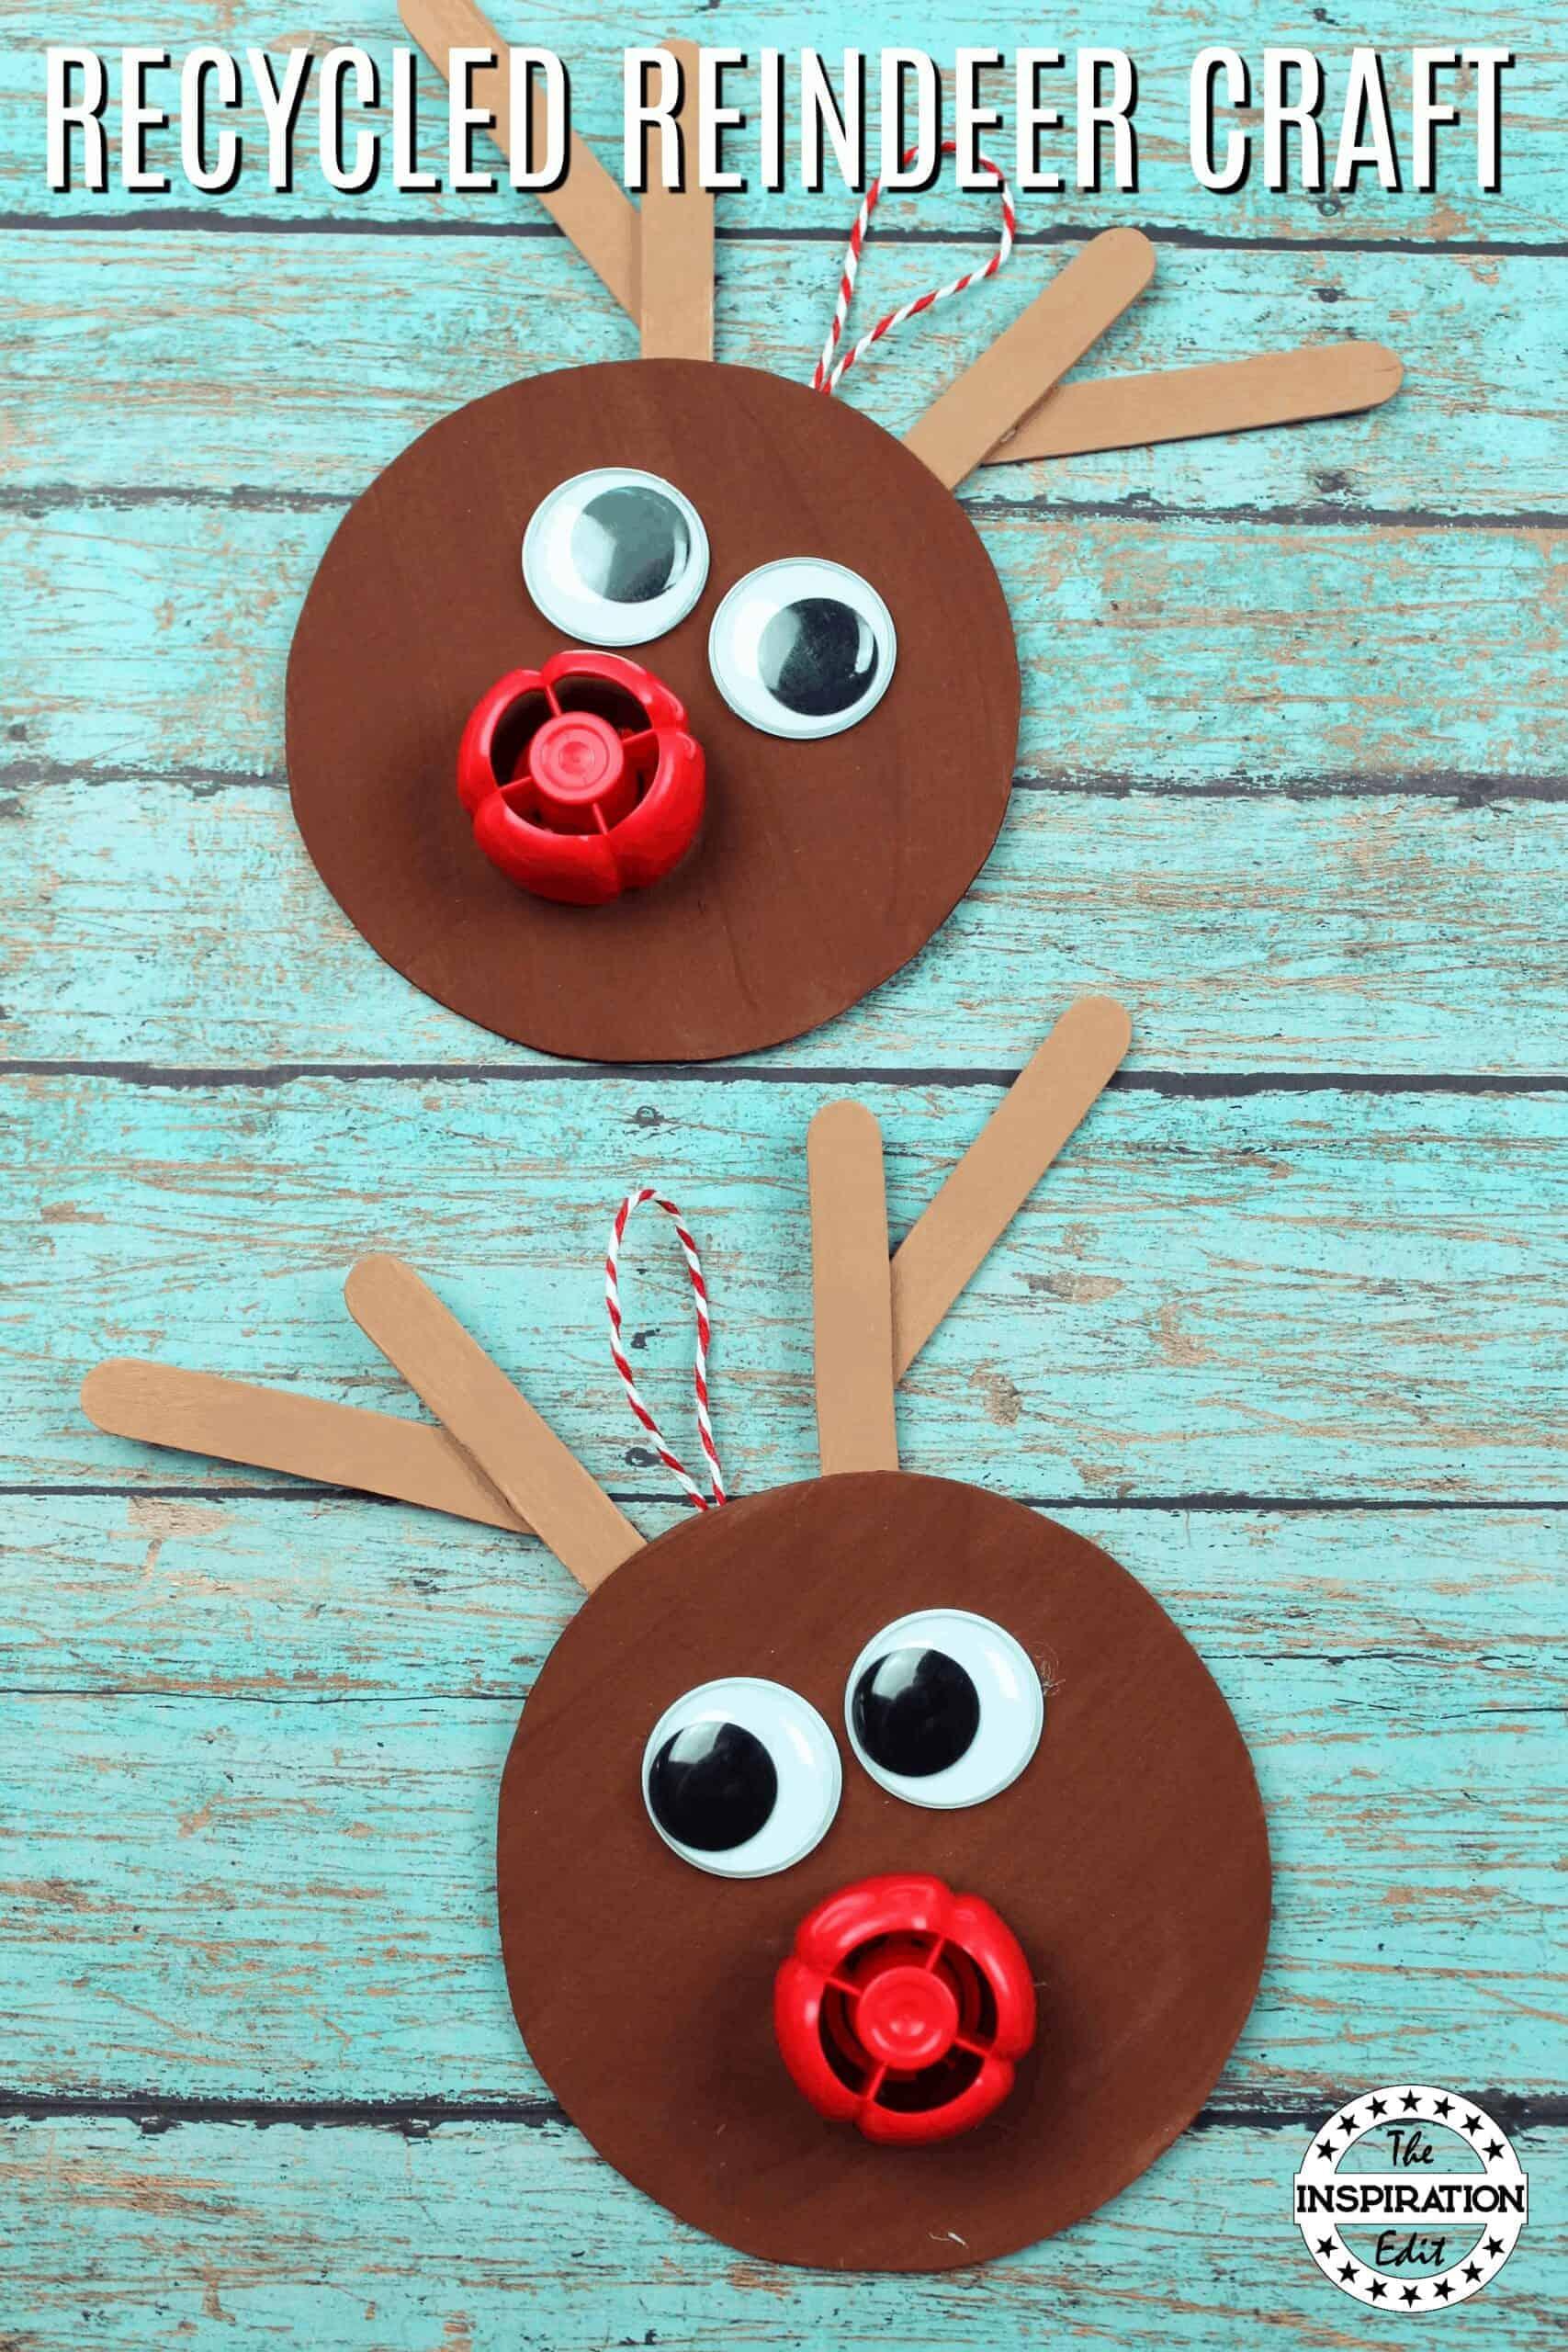 recycled reindeer craft